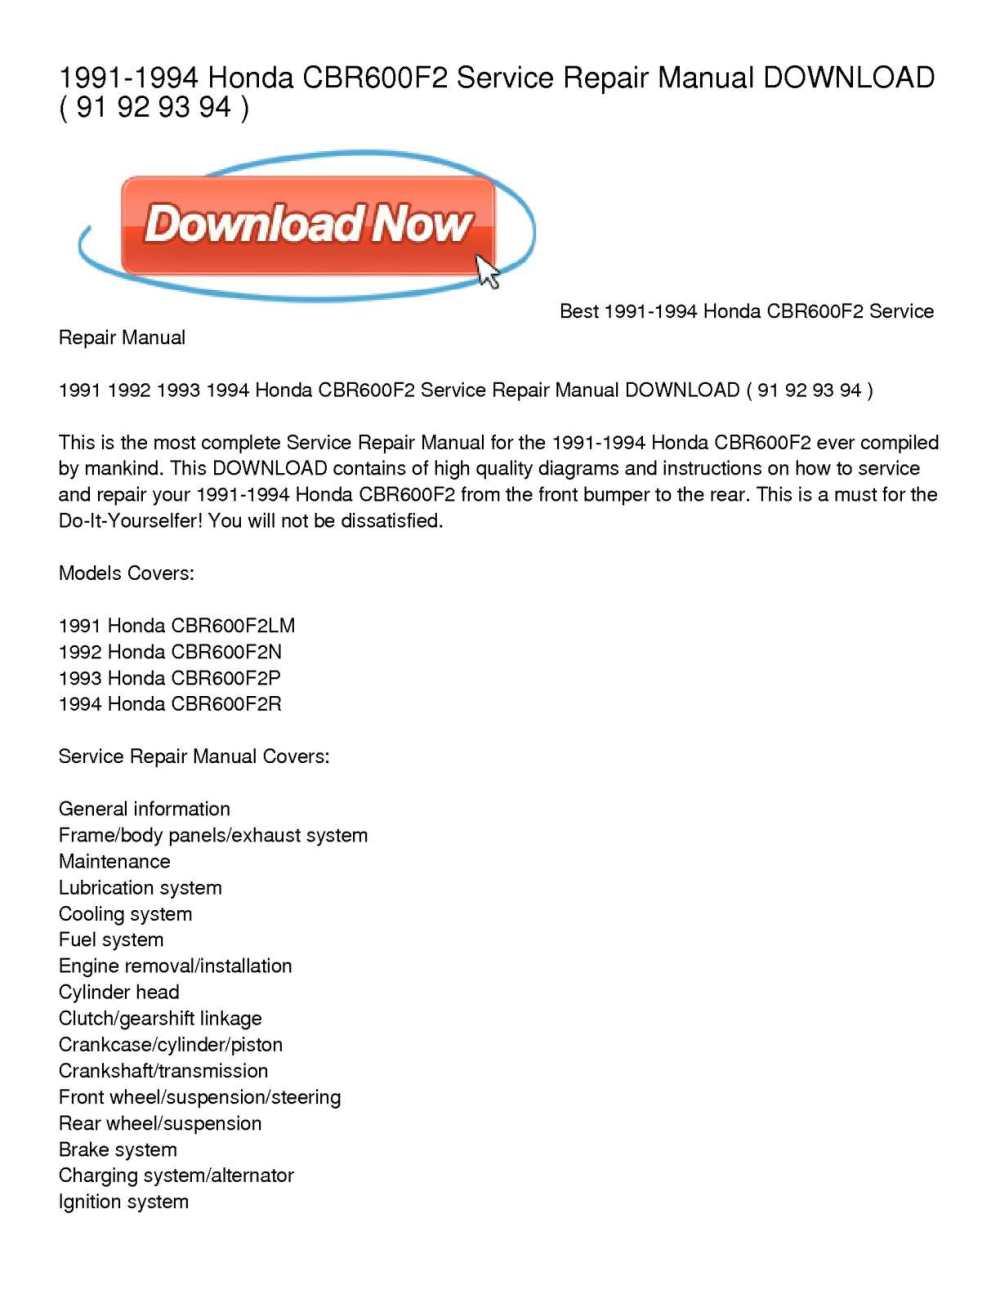 medium resolution of 1991 1994 honda cbr600f2 service repair manual download